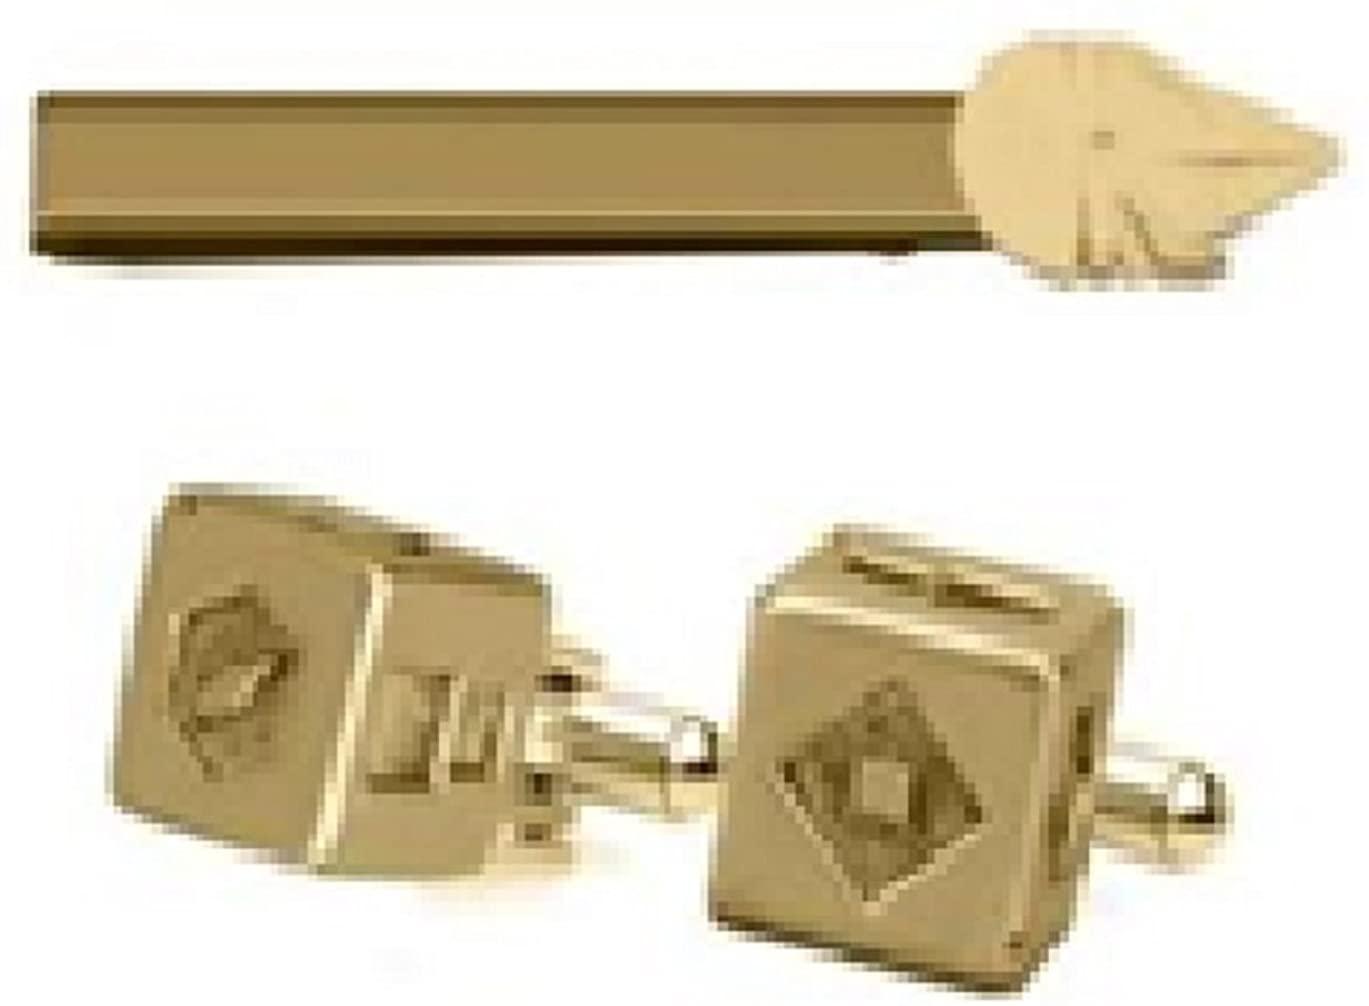 Star Wars, Millenium DICE Money Clip and Cufflinks Set - Stainless Steel Gold Plated Artwork